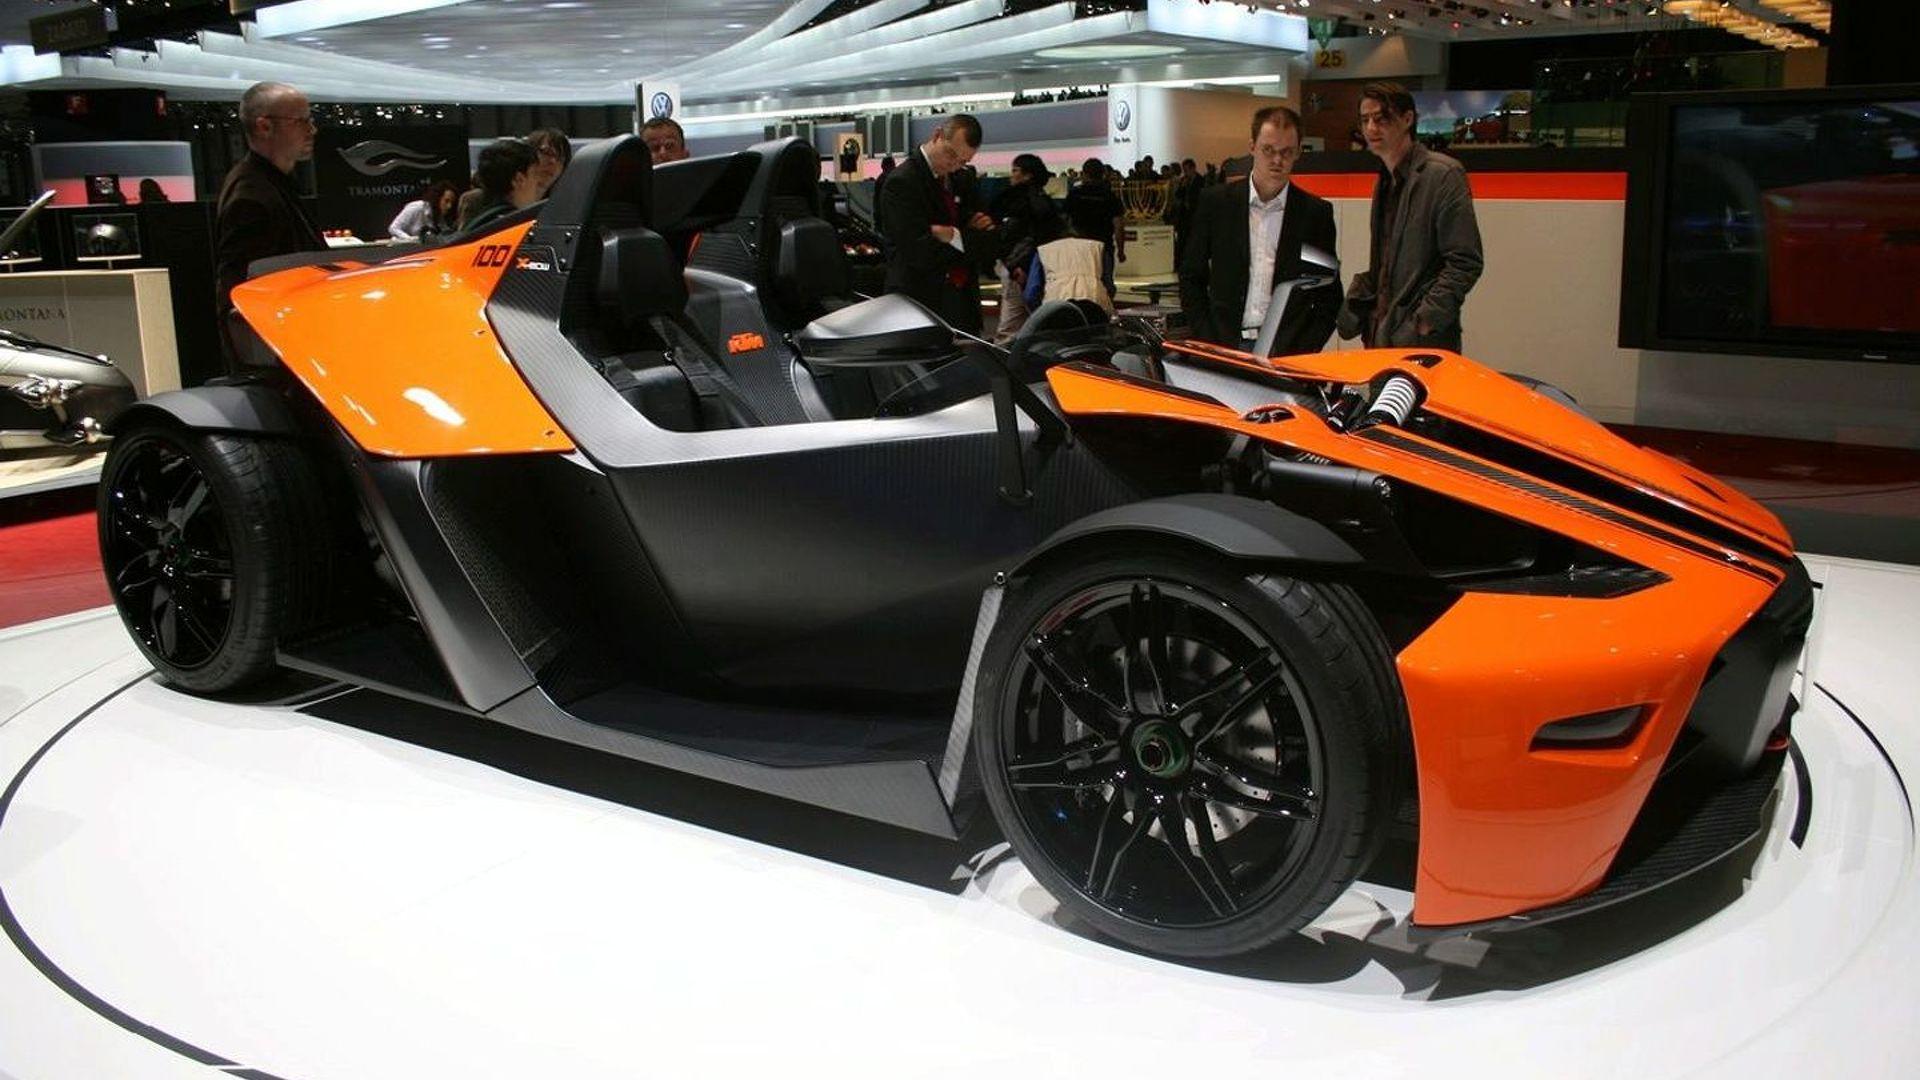 Ktm X Bow >> Ktm X Bow Dallara In Geneva 100 Units Only